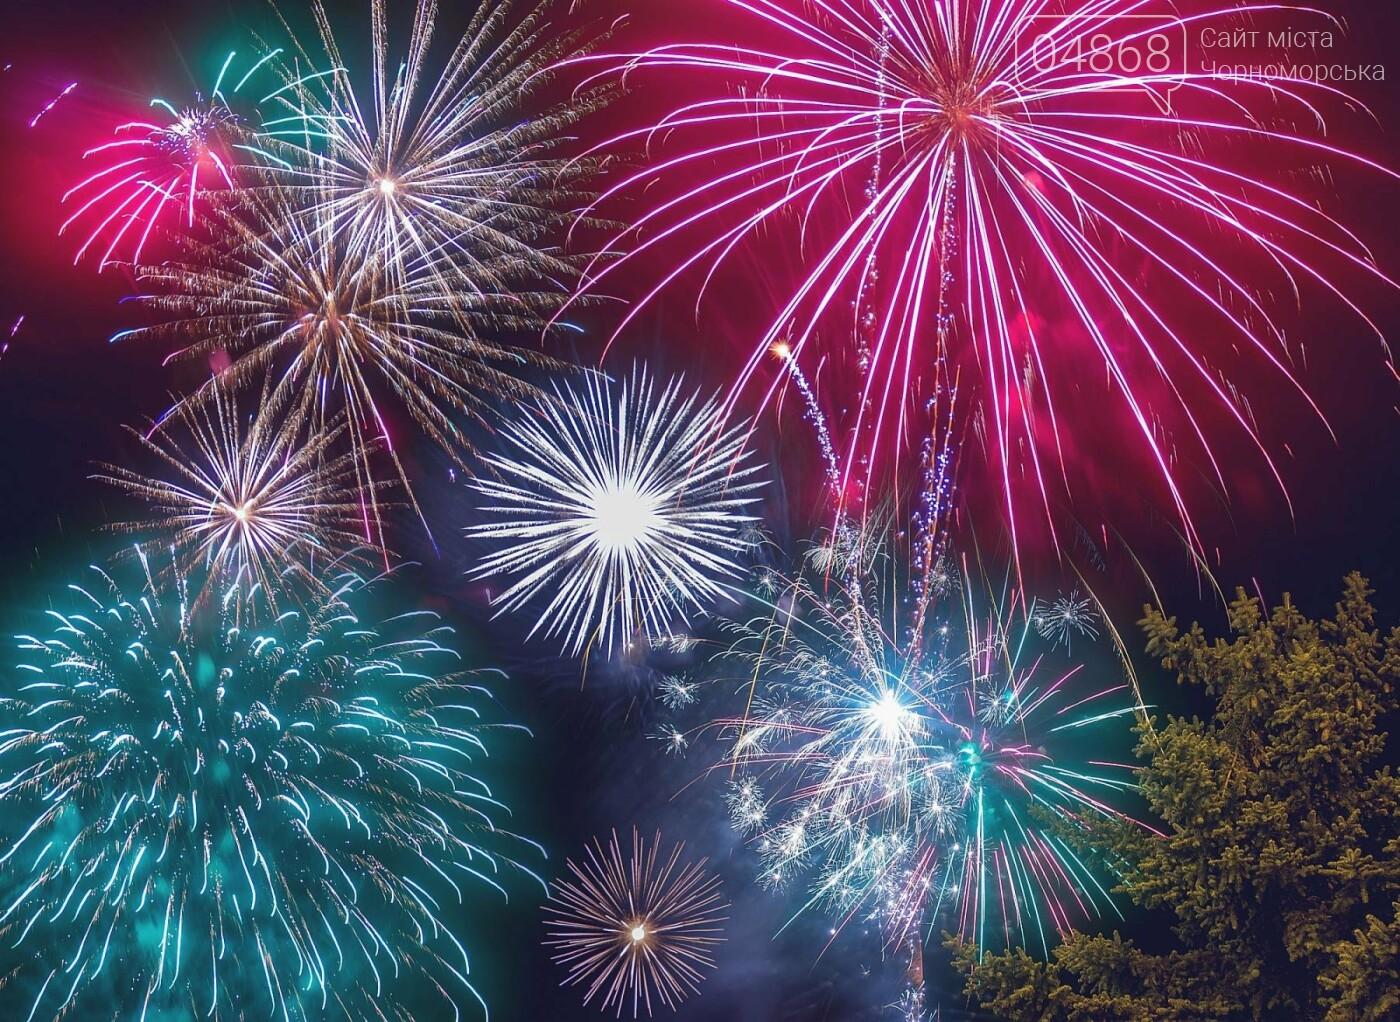 План благоустройства и мероприятий ко Дню рождения Черноморска принят на заседании исполкома, фото-13